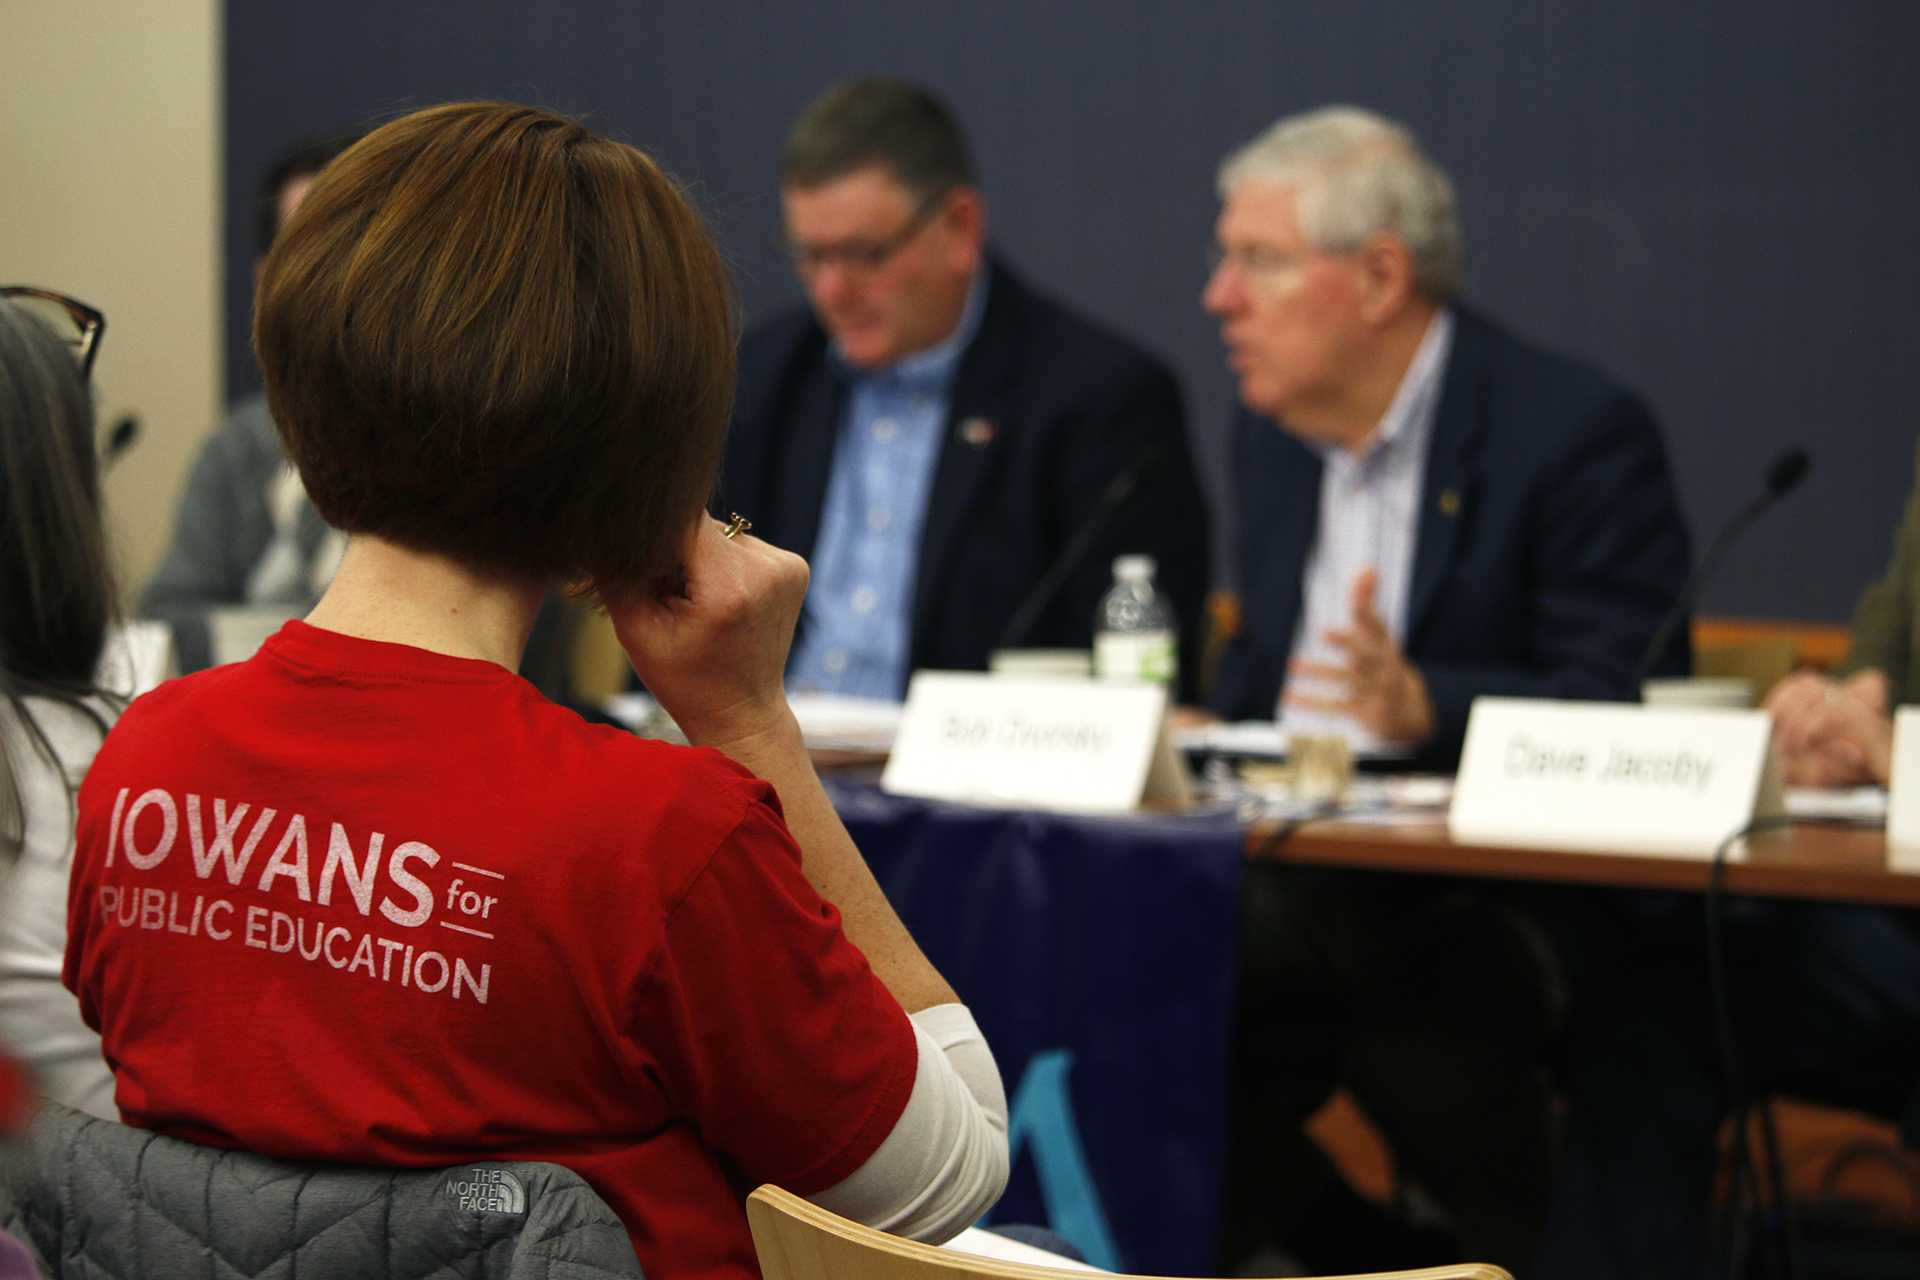 Local legislators meet with constituents during public forum on education